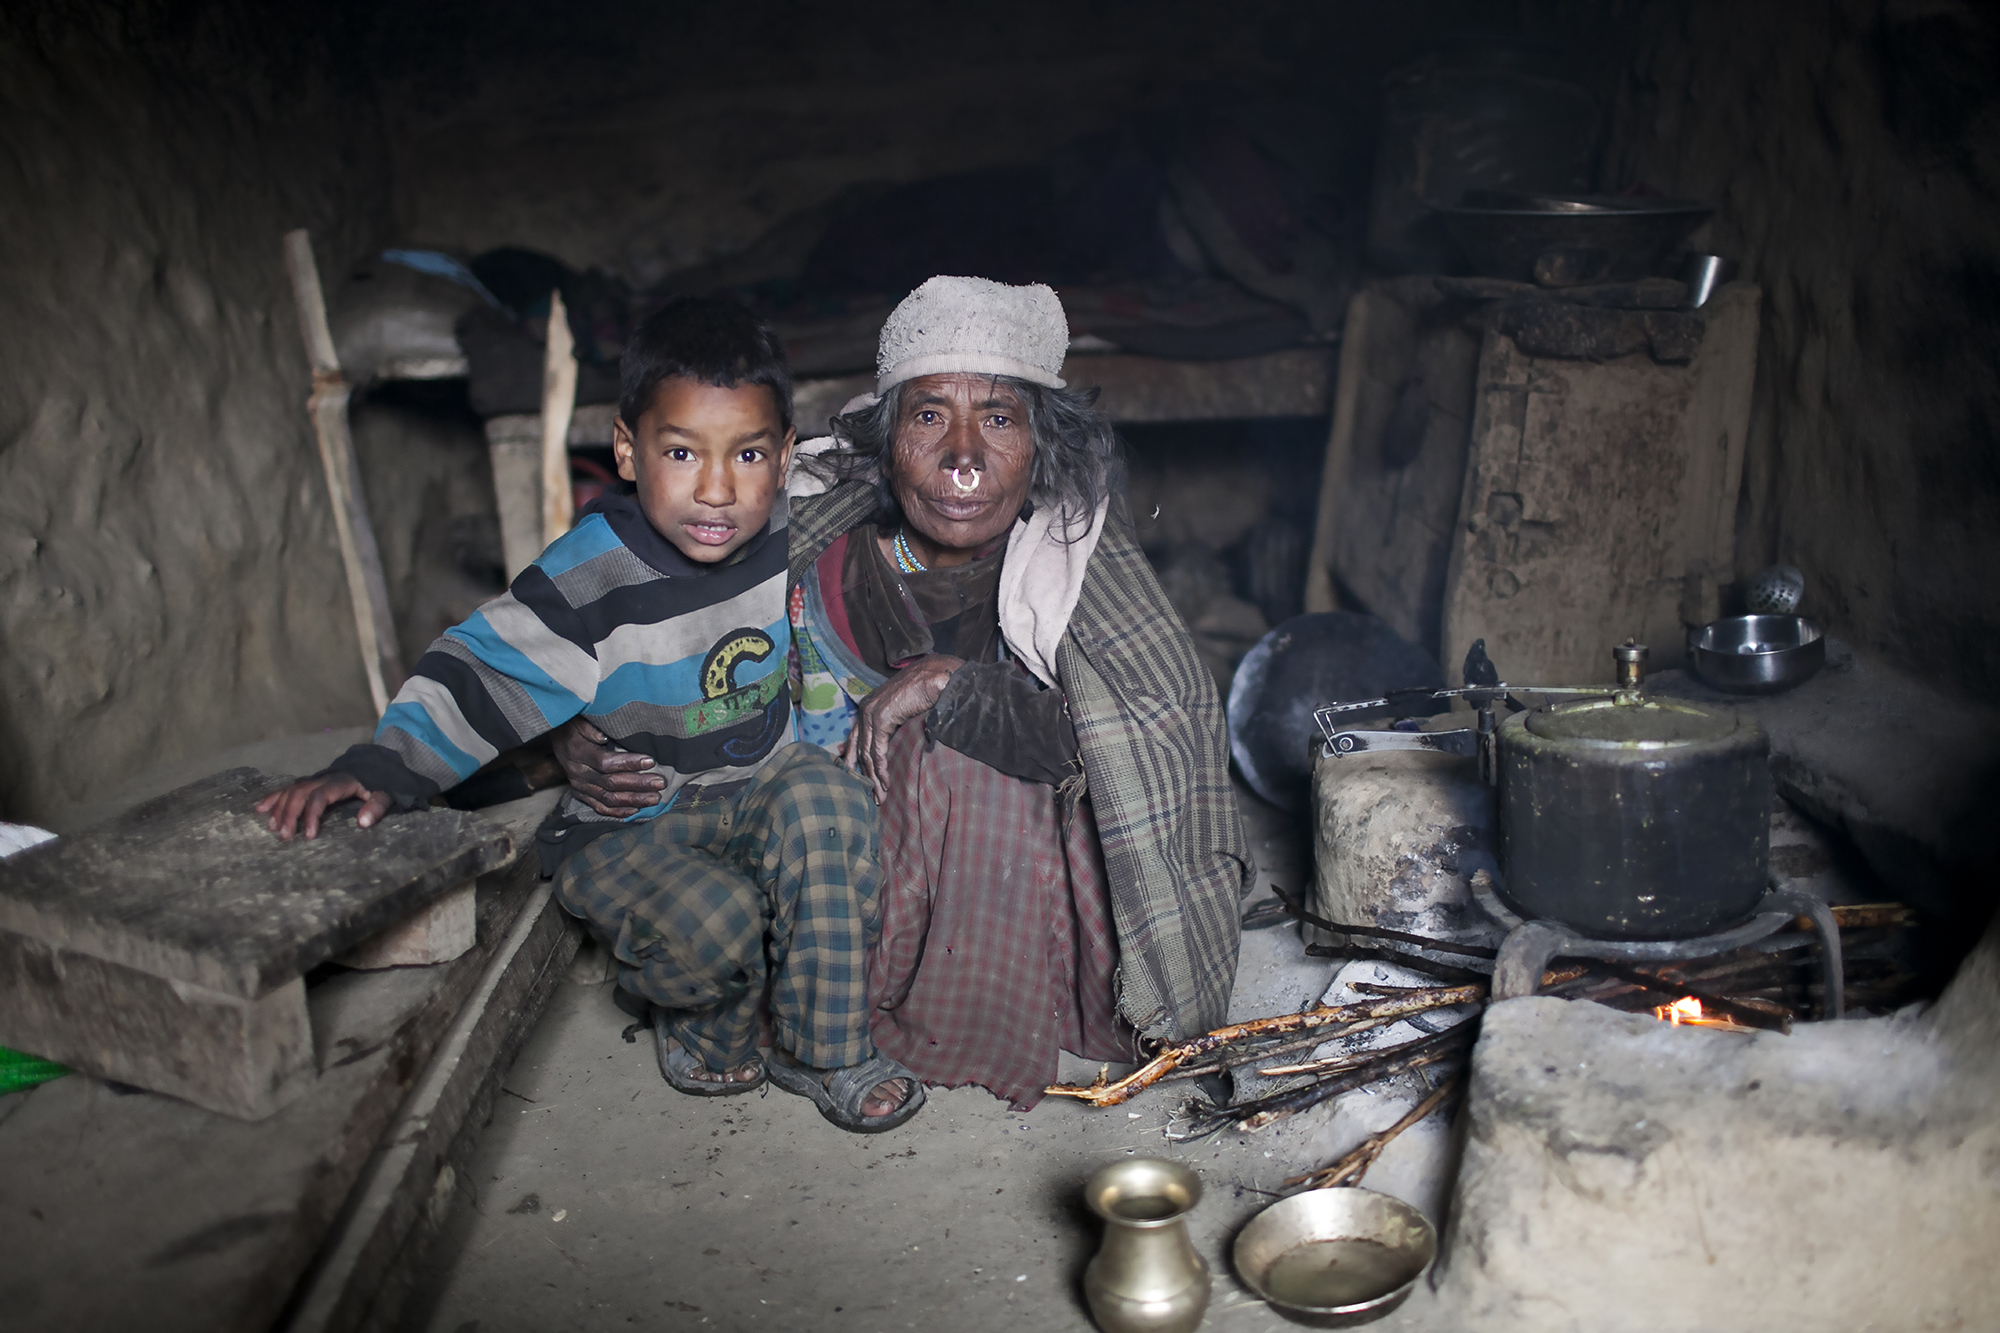 Nepal_RB_FoodCrisis09